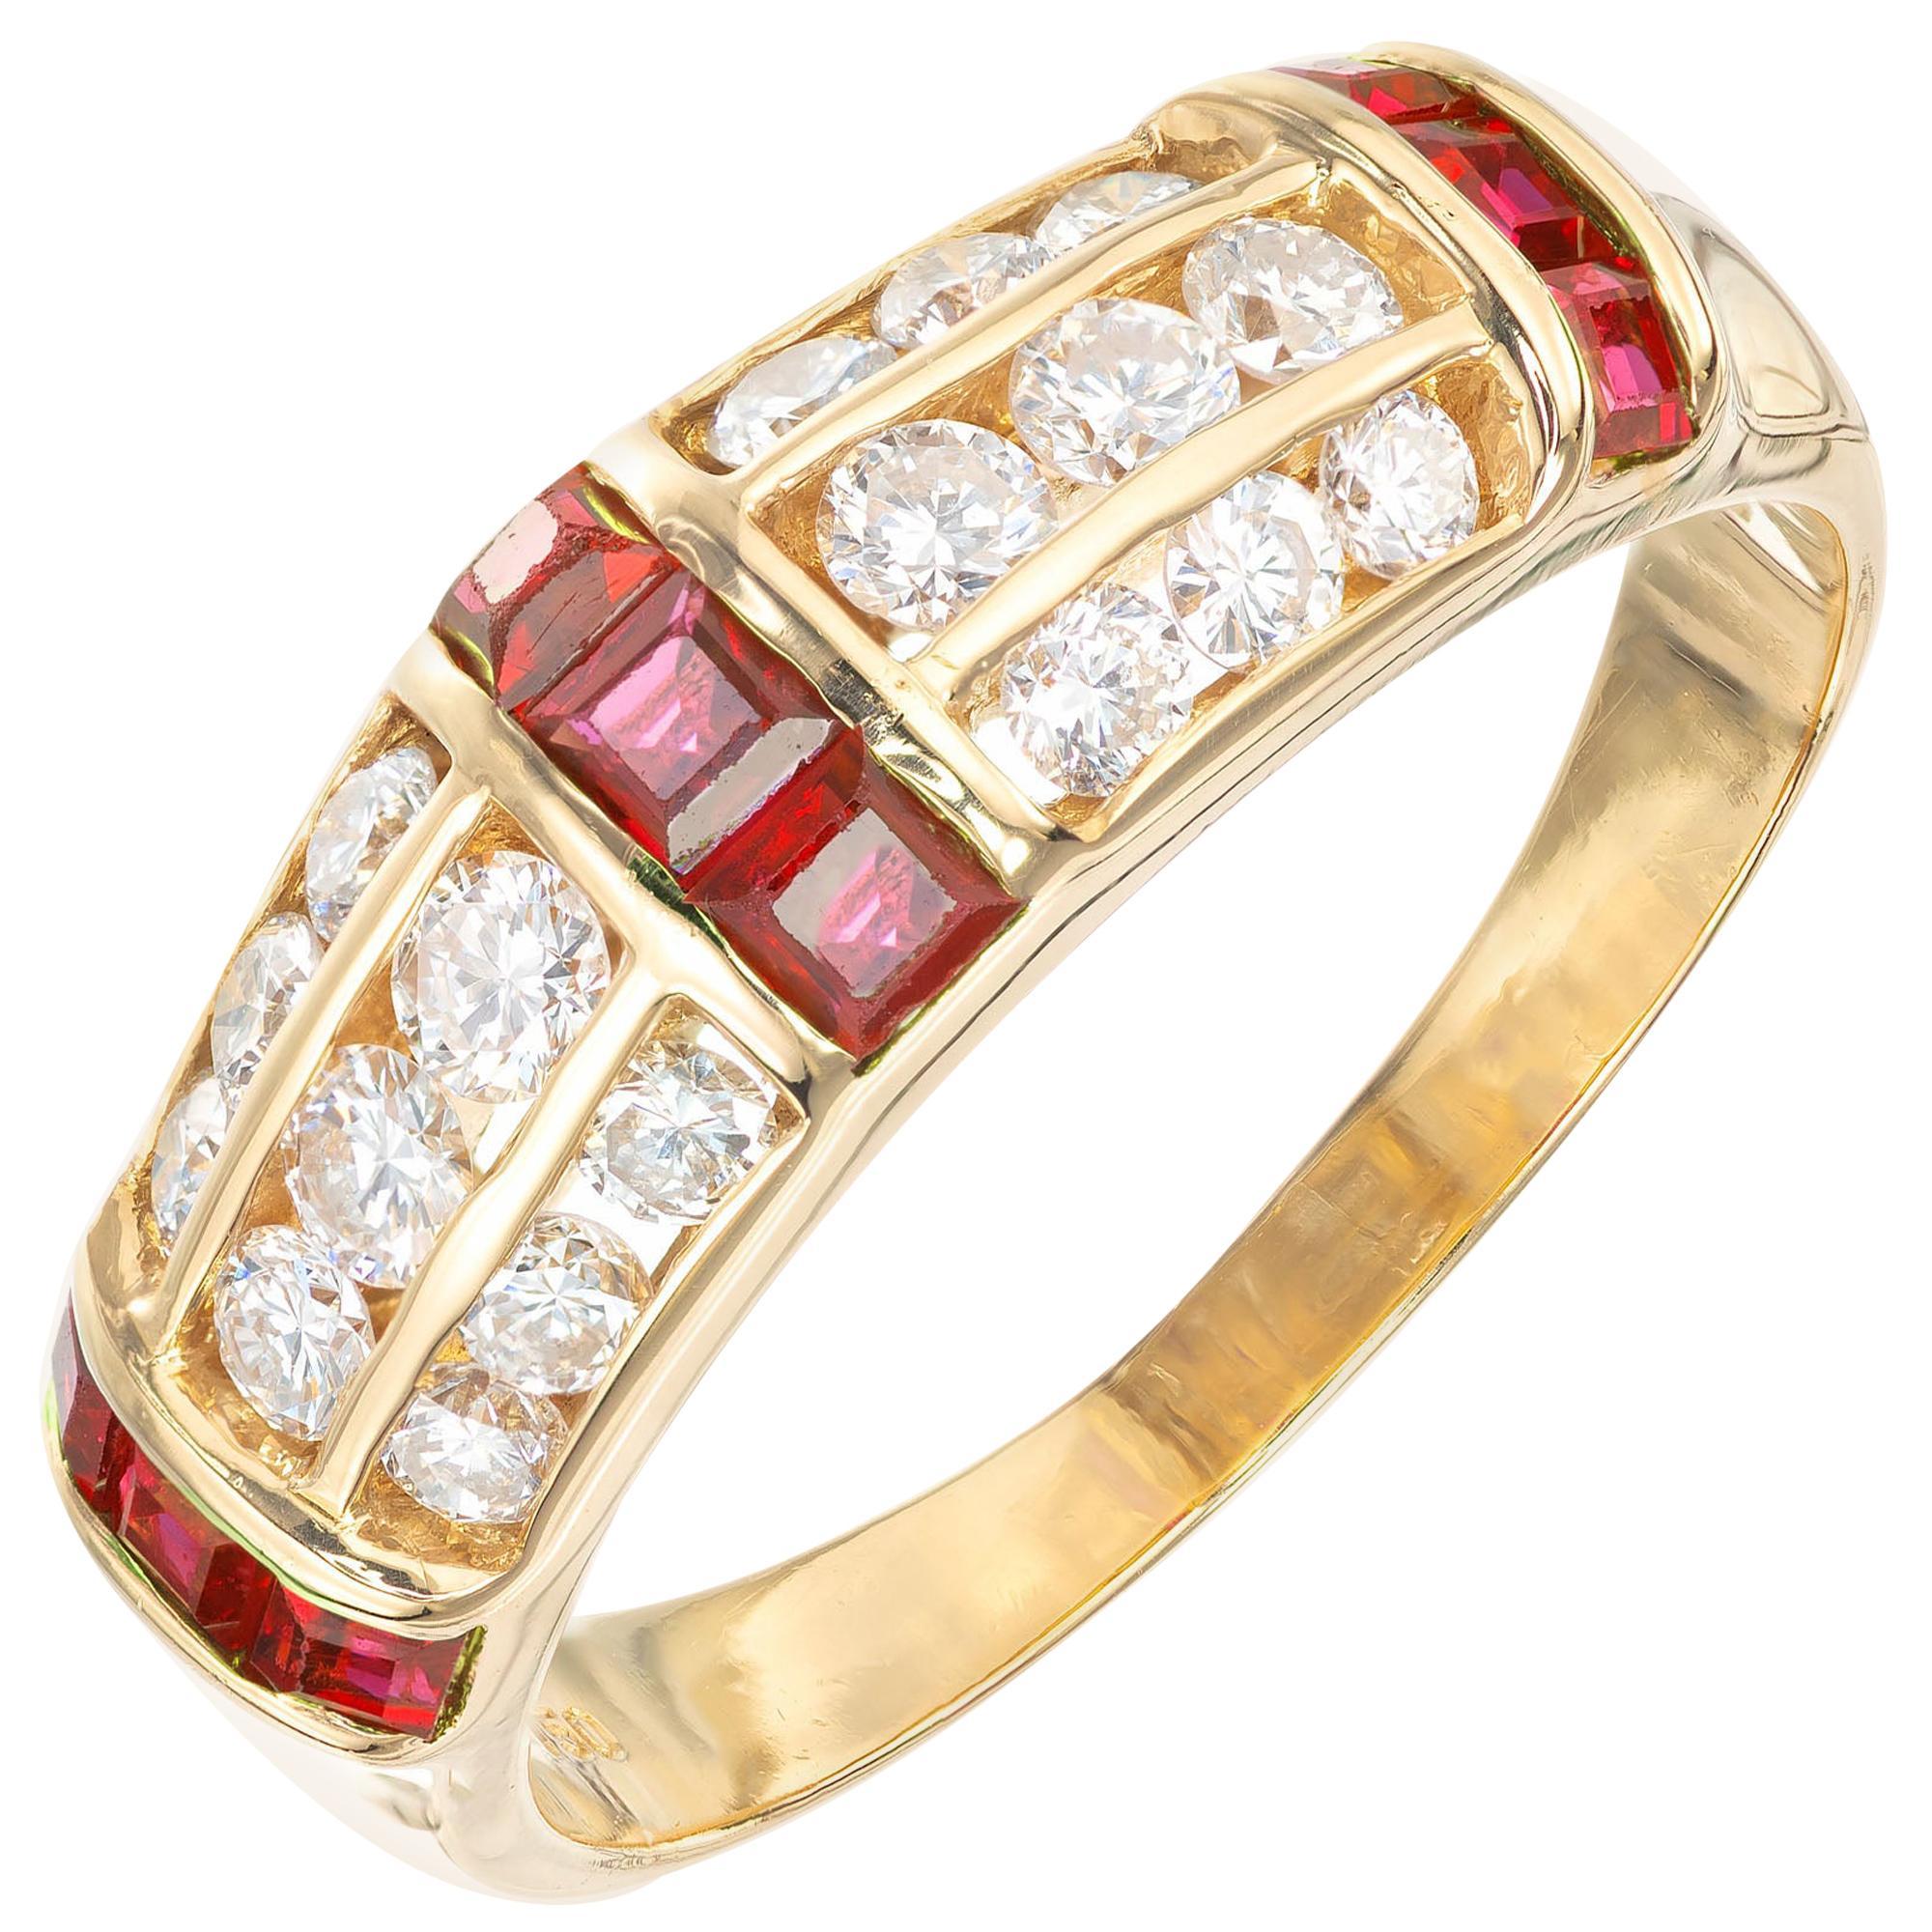 .79 Carat Ruby Diamond Yellow Gold Three-Row Band Ring